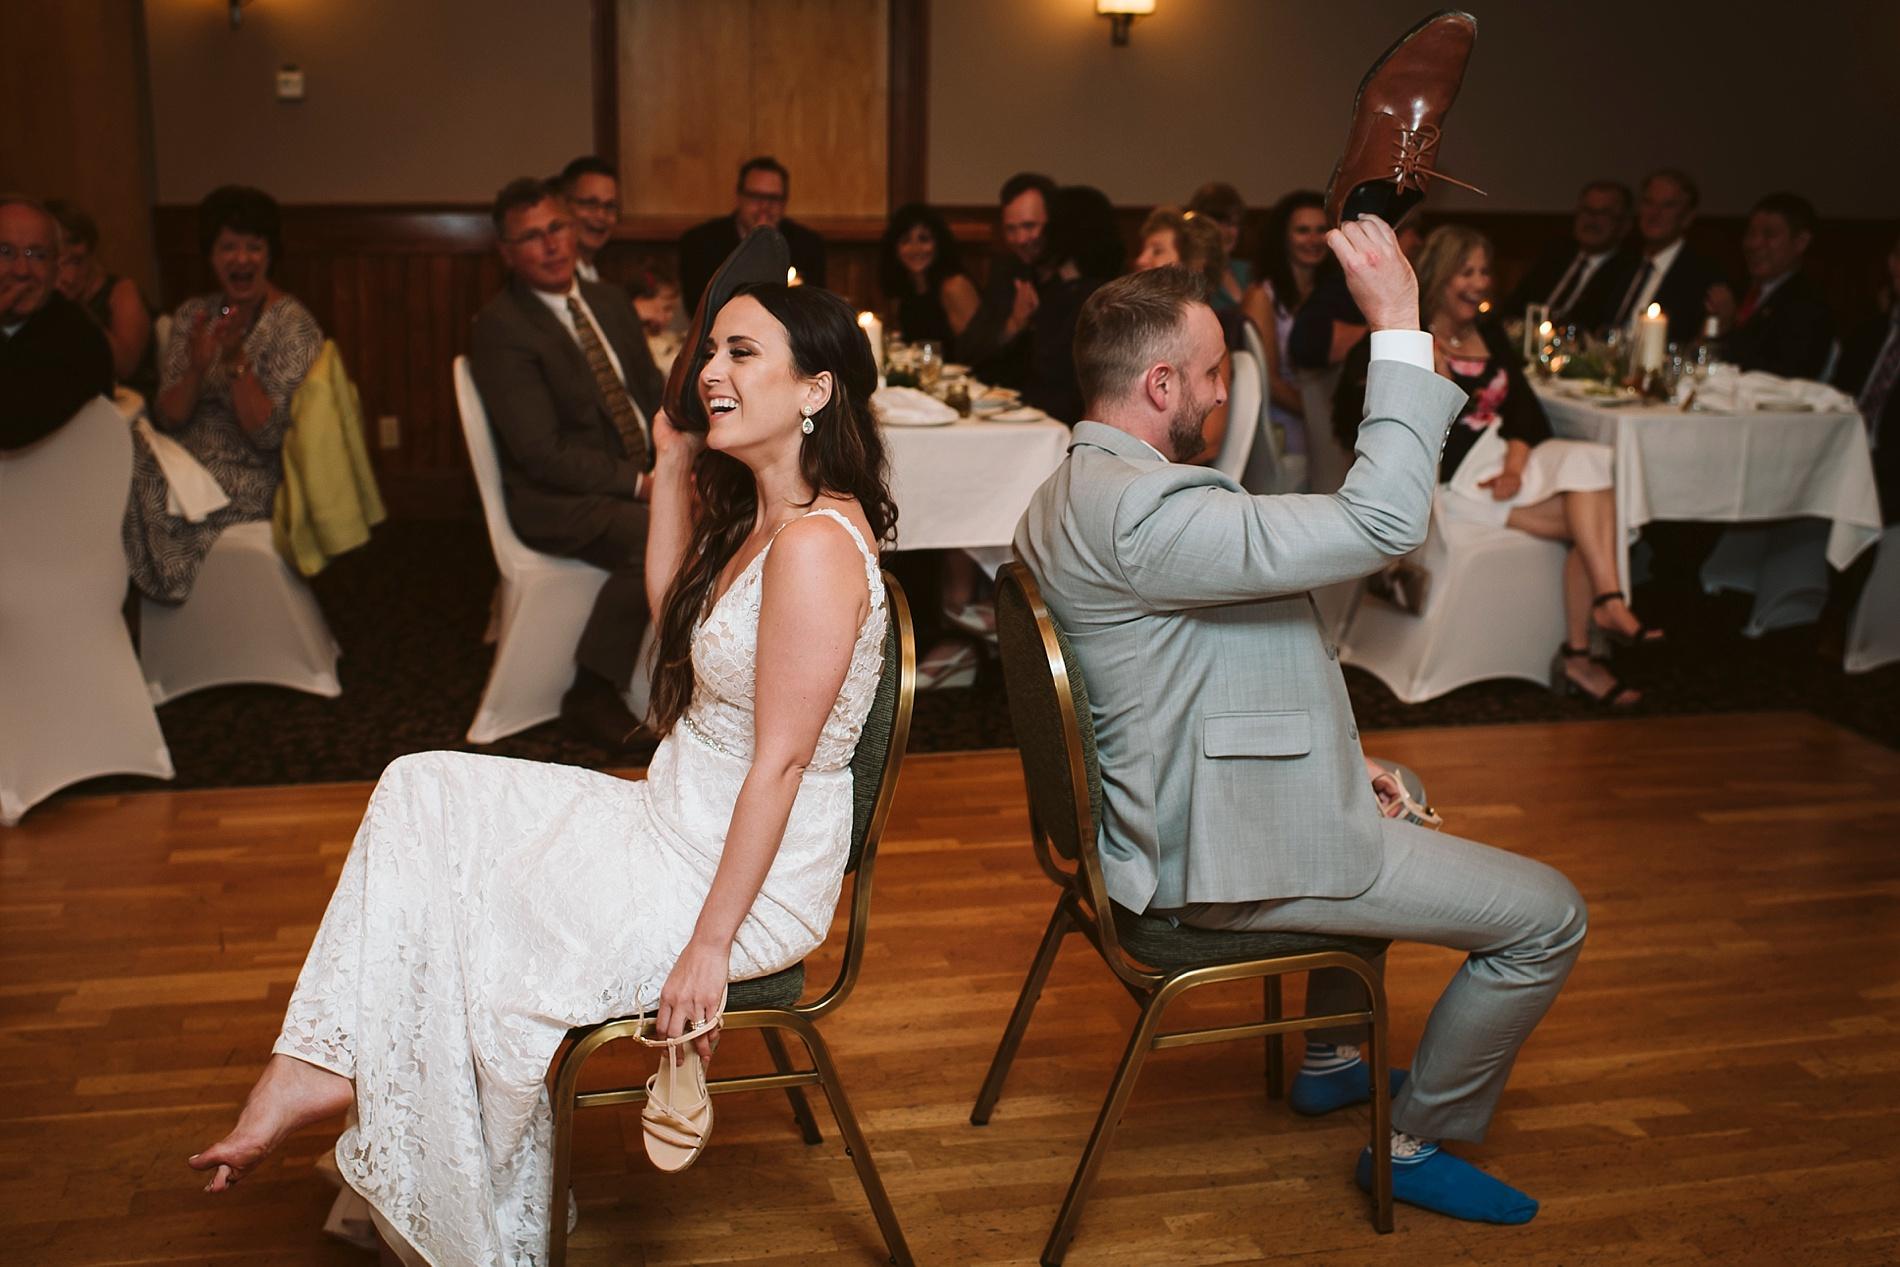 Kawartha_Lakes_Wedding_Bobcageon_Eganridge_Resort_Toronto_Photographer_0073.jpg